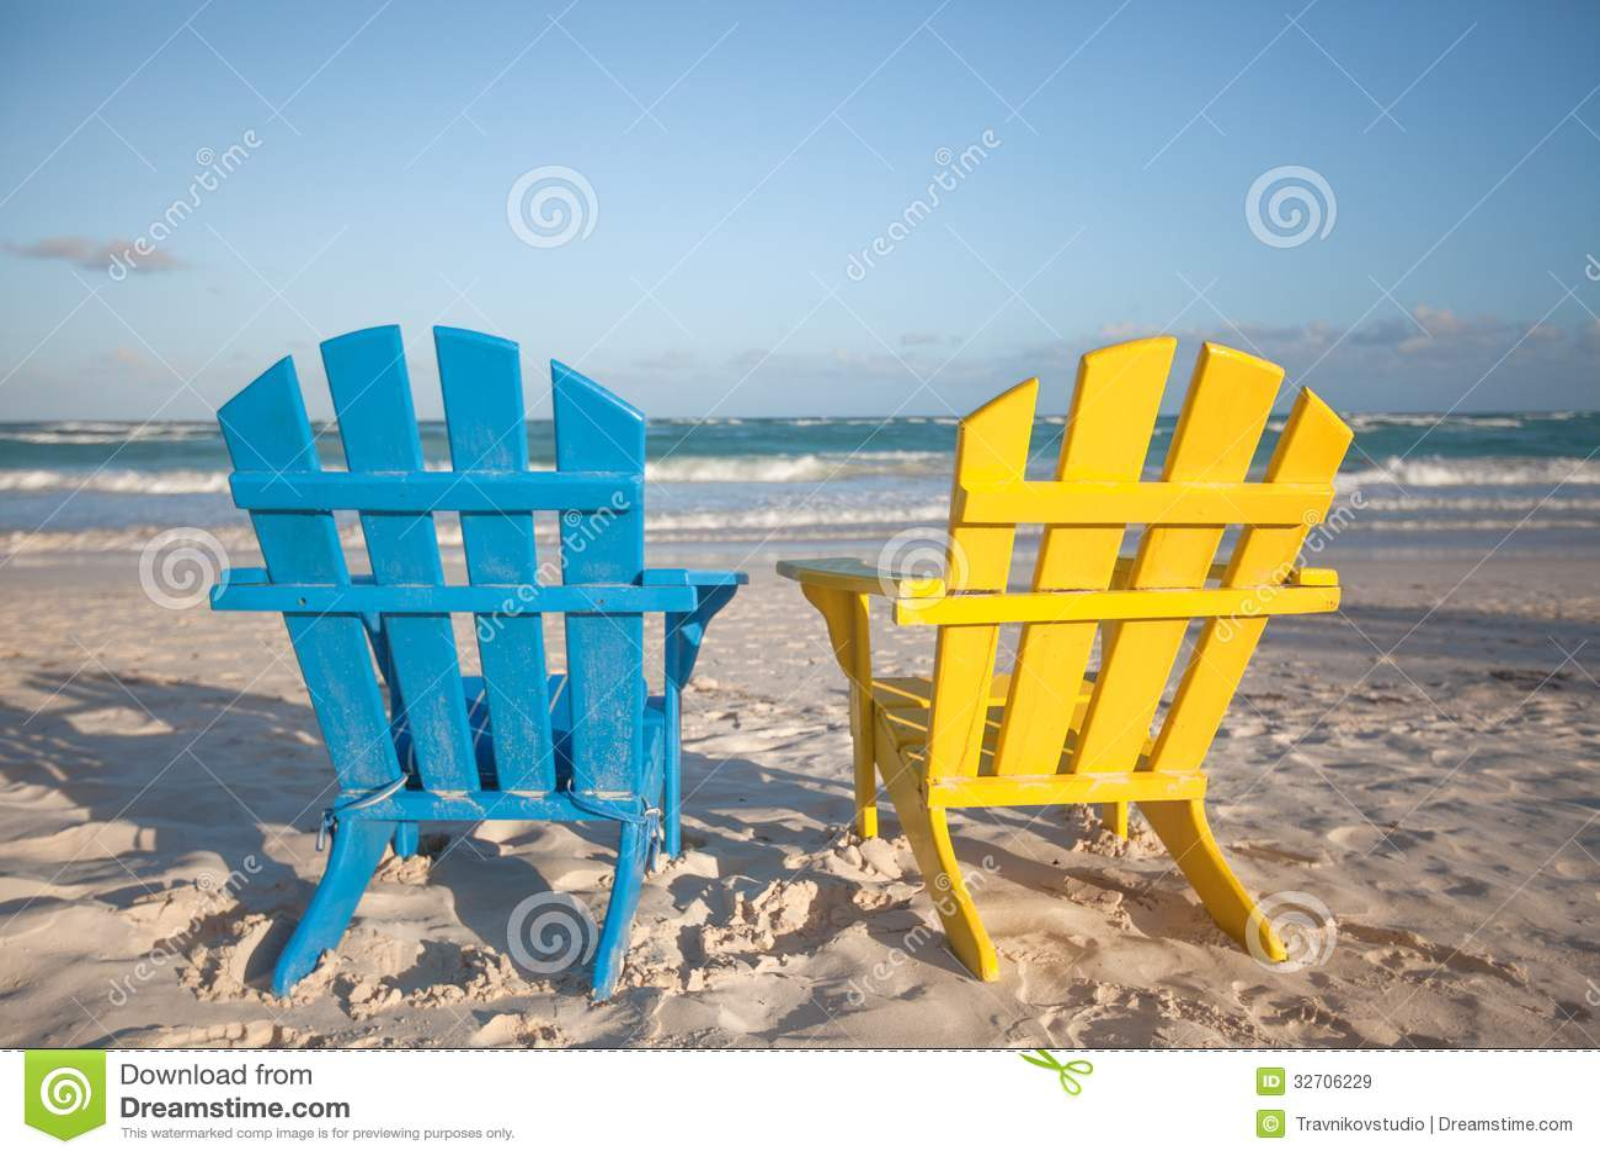 Sillas para playa silla tumbona oceanic sun para playa y for Sillas para jugar xbox